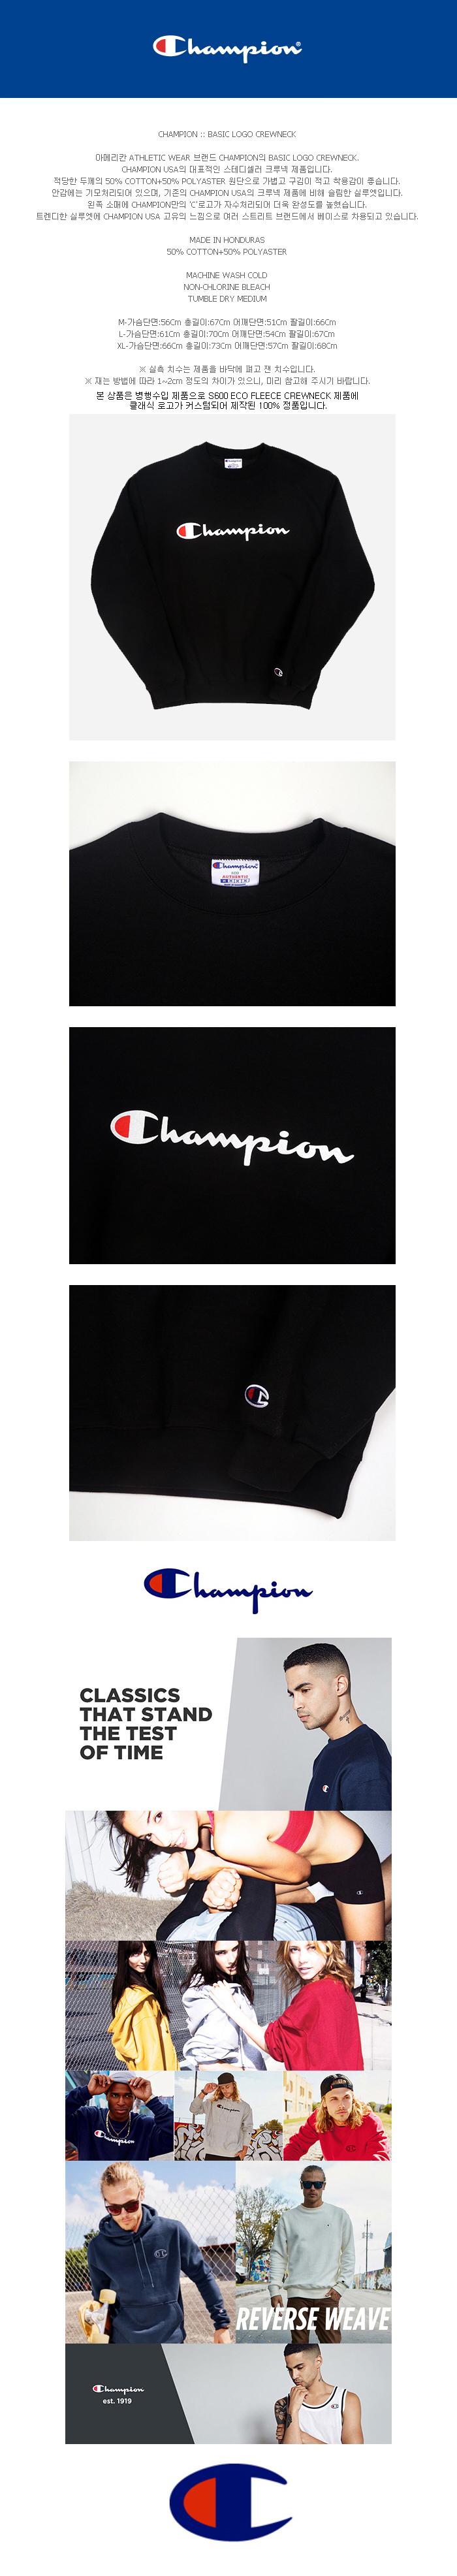 [CHAMPION]챔피온 BASIC LOGO CREWNECK (BLACK) 베이직 로고 크루넥 스��셔츠 맨투맨 정품 국내배송